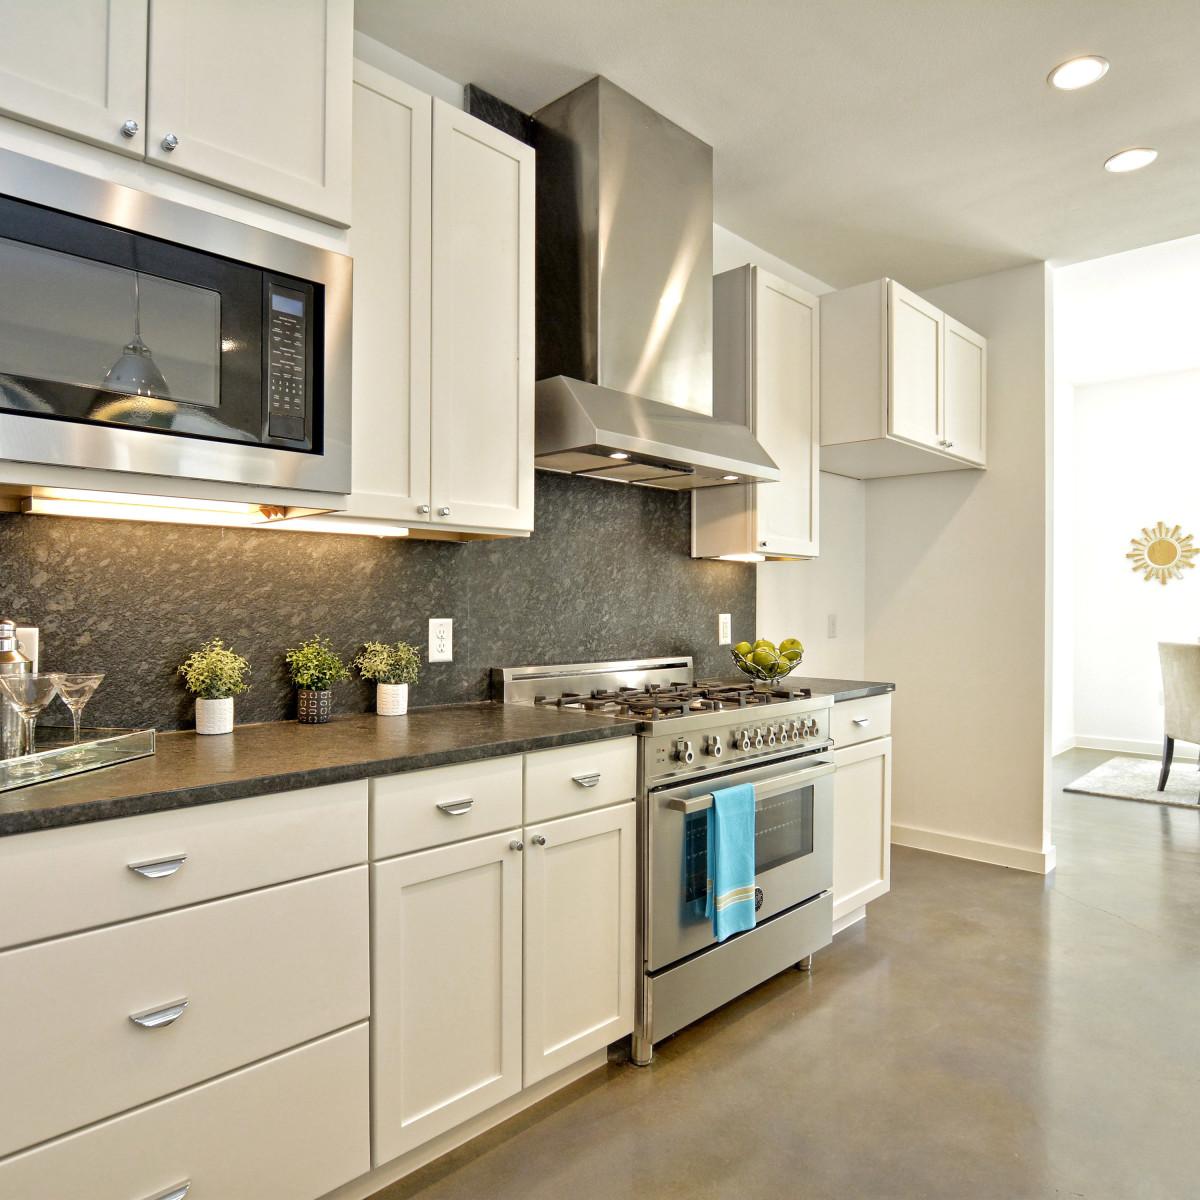 1804 Frazier Austin house for sale kitchen